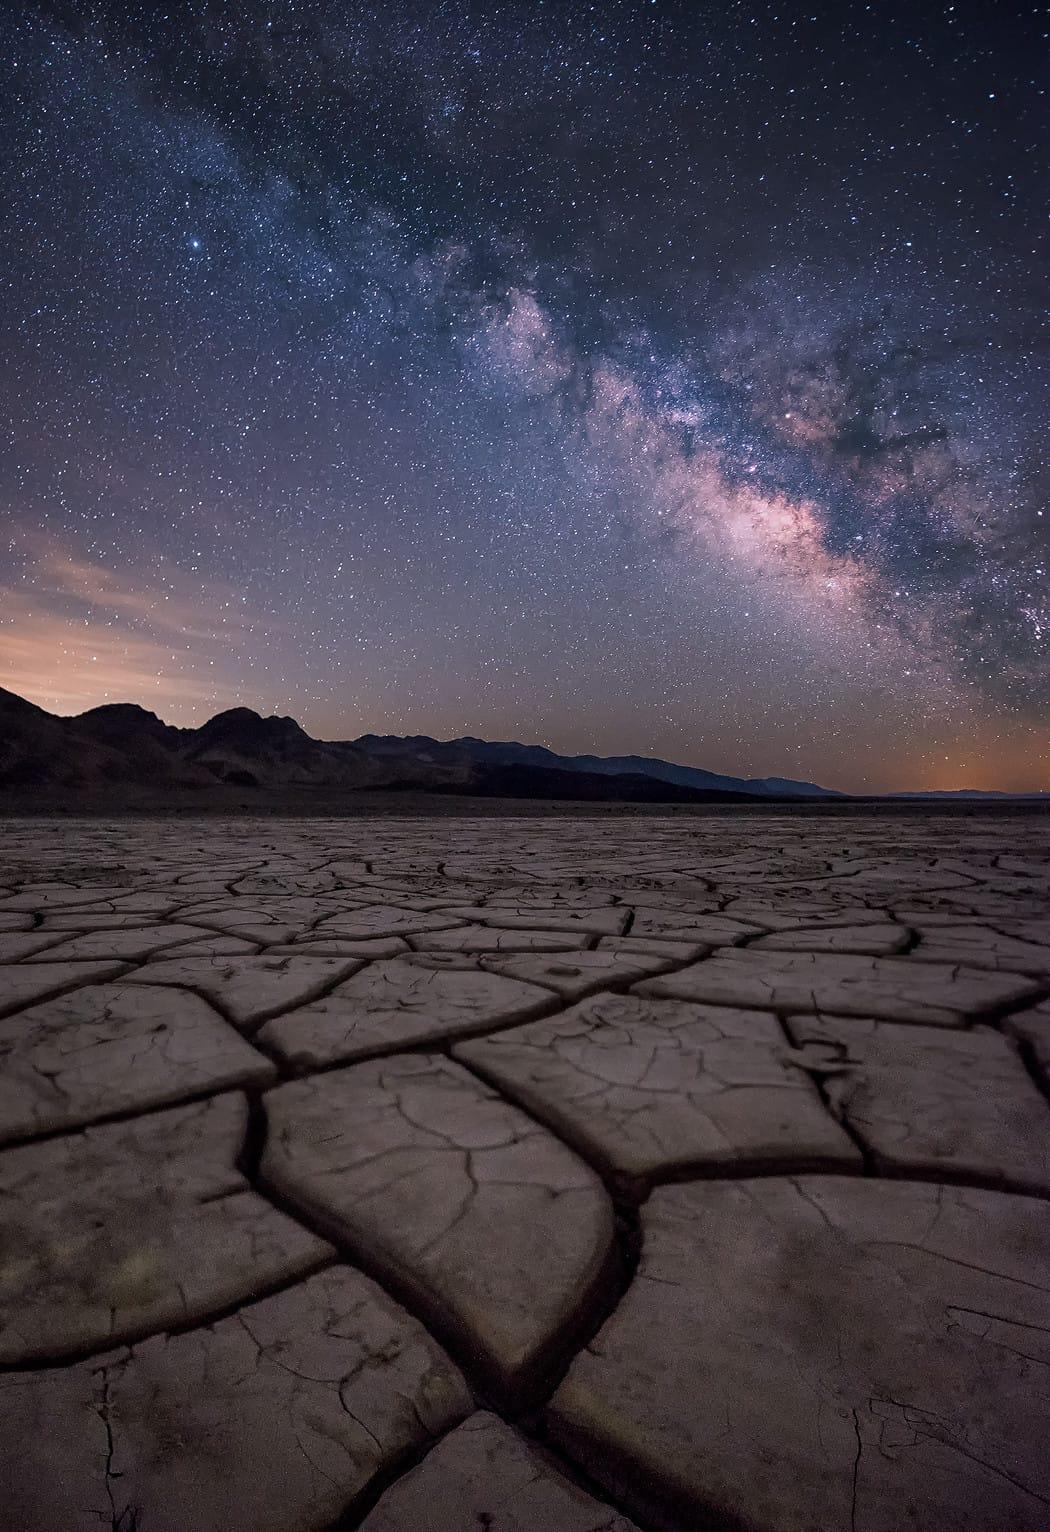 Death Valley Stargazing - Jay Huang via Flickr